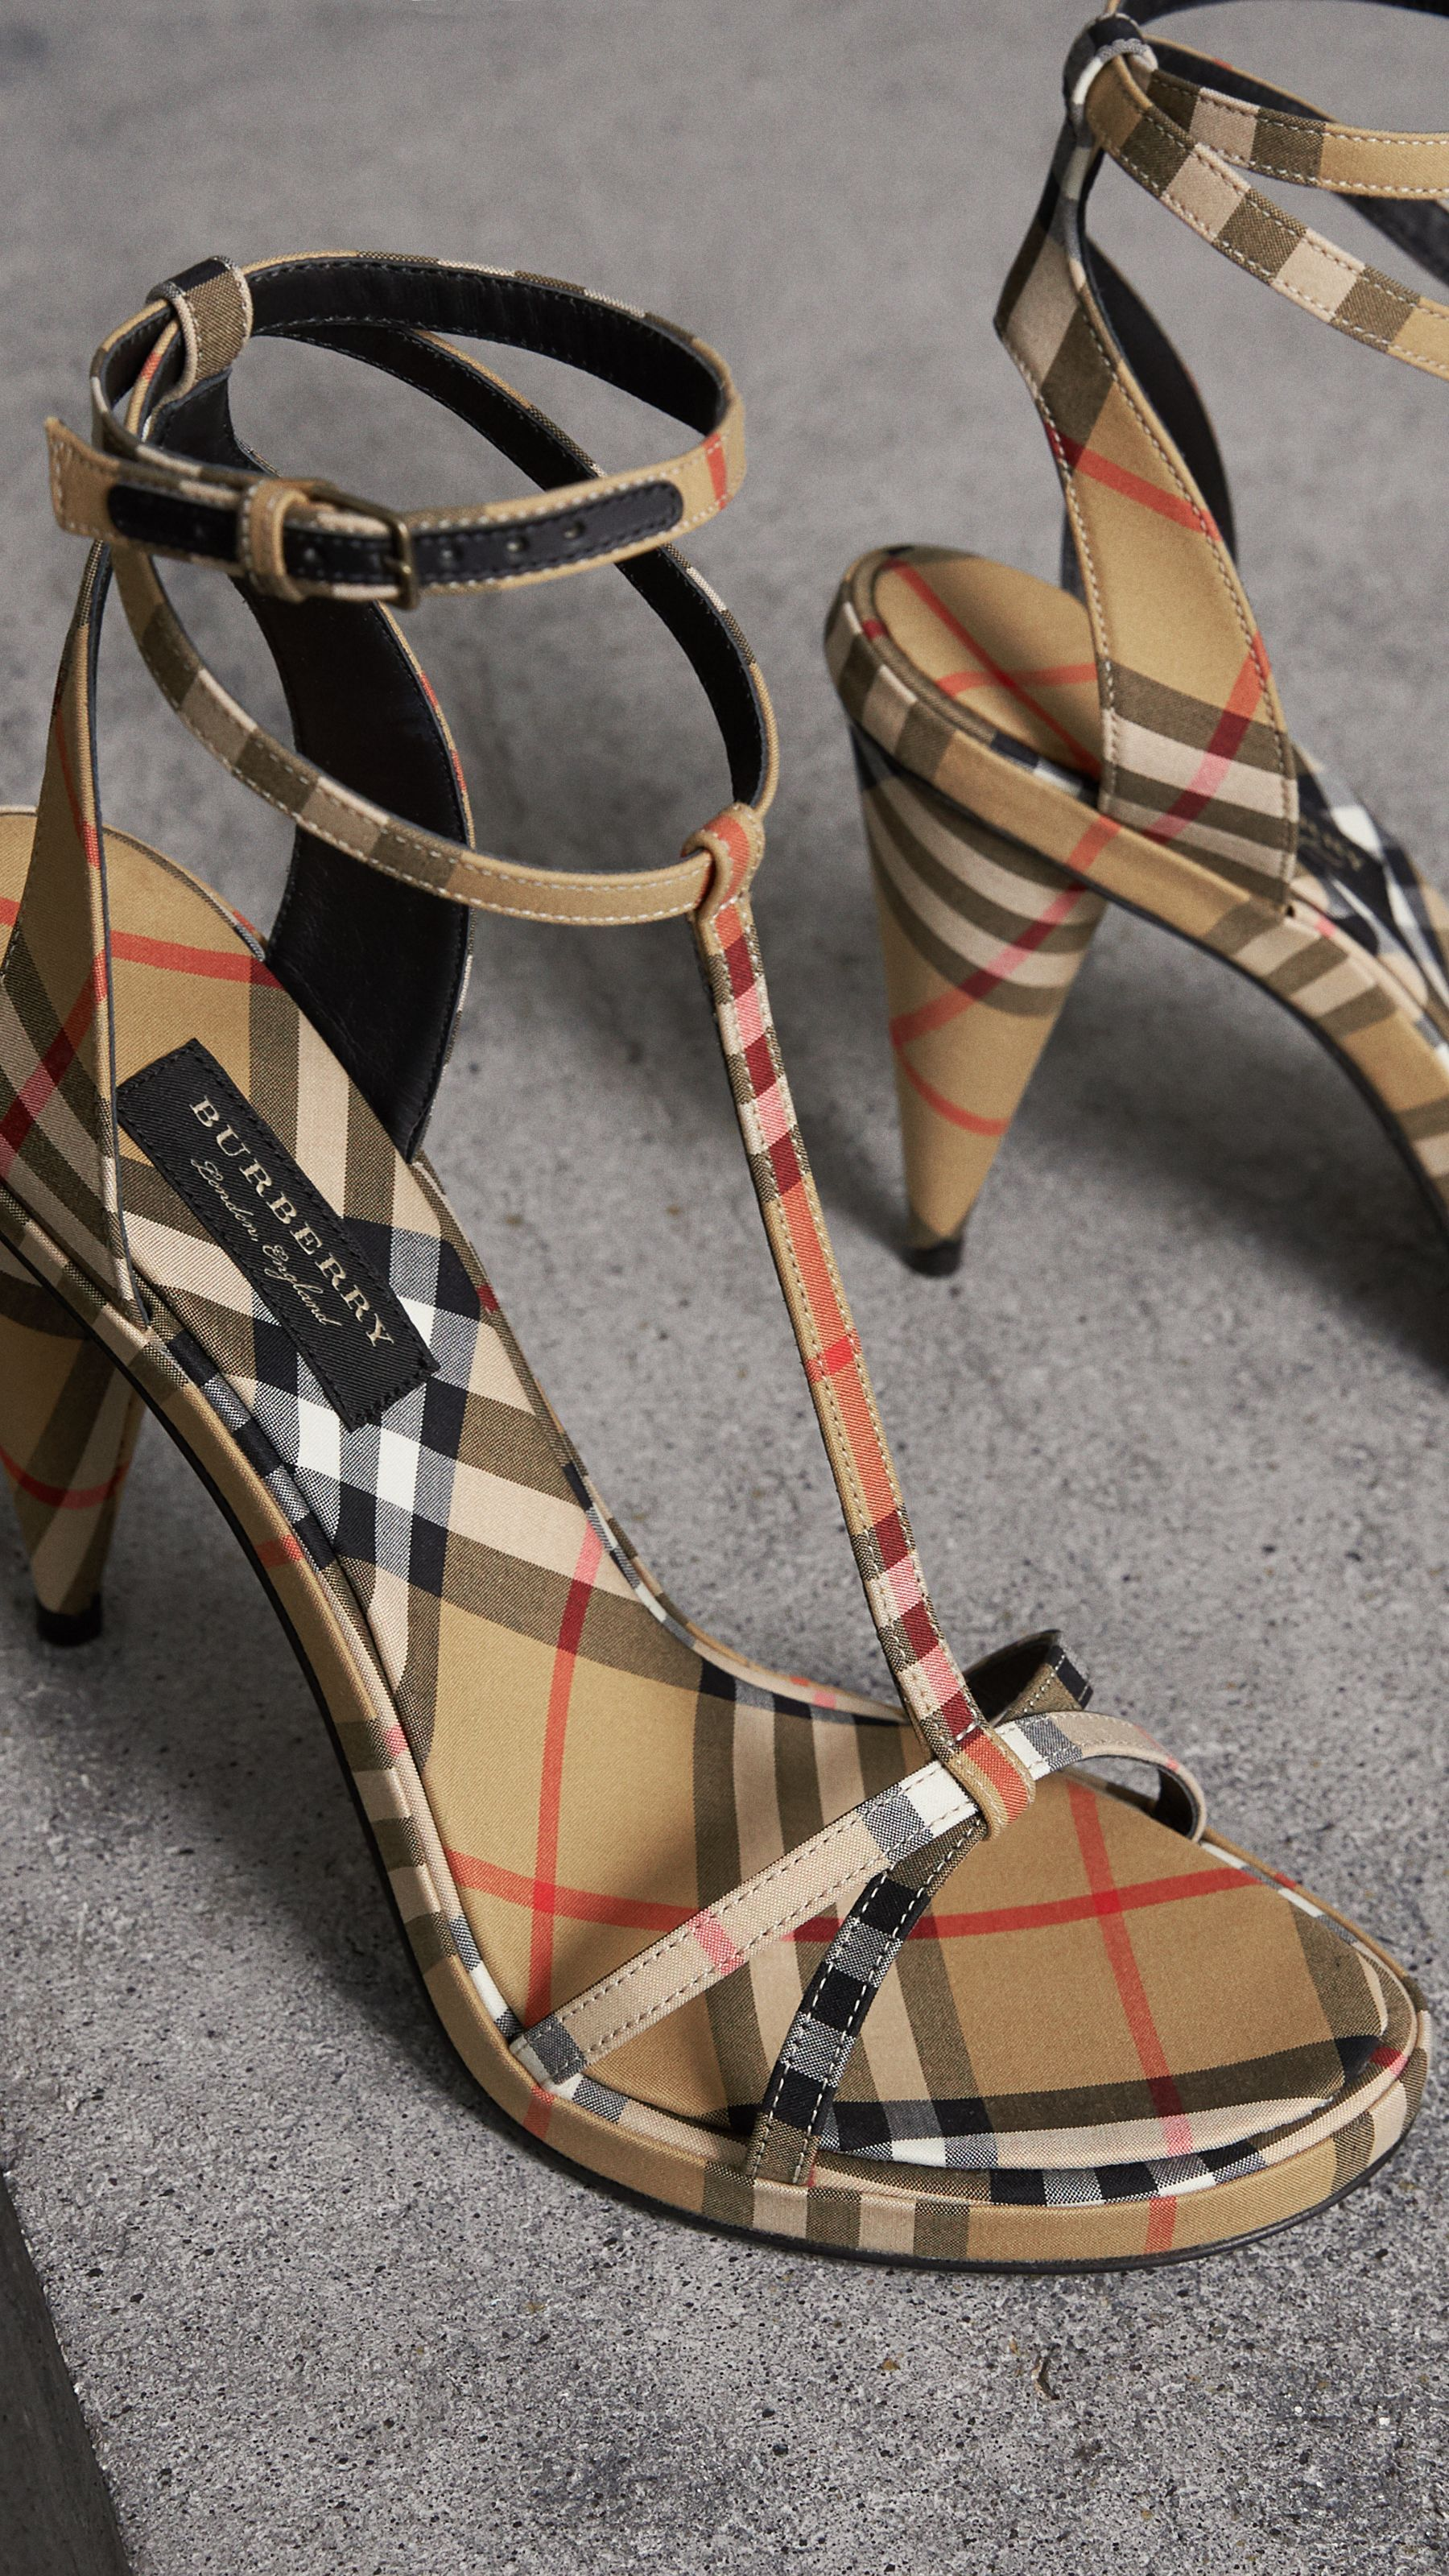 Vintage Check Cotton High-heel Sandals